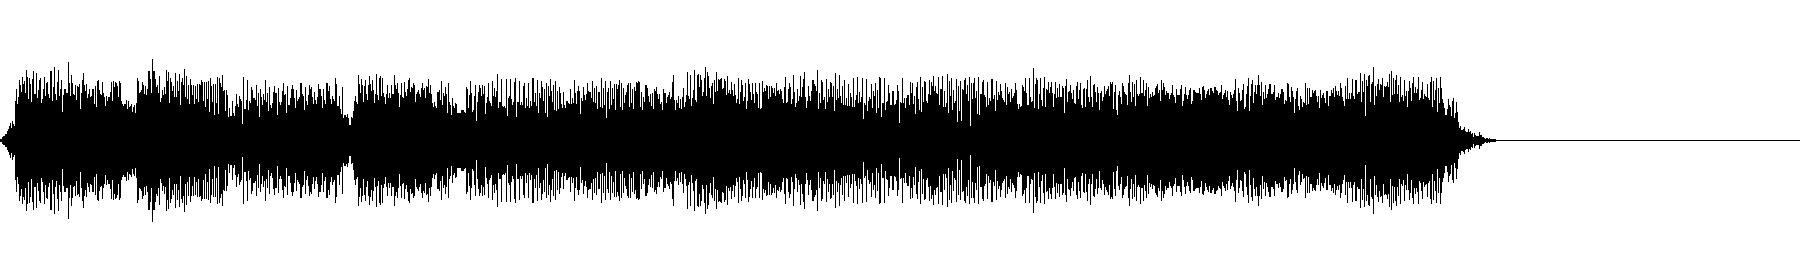 guitarrock02 130